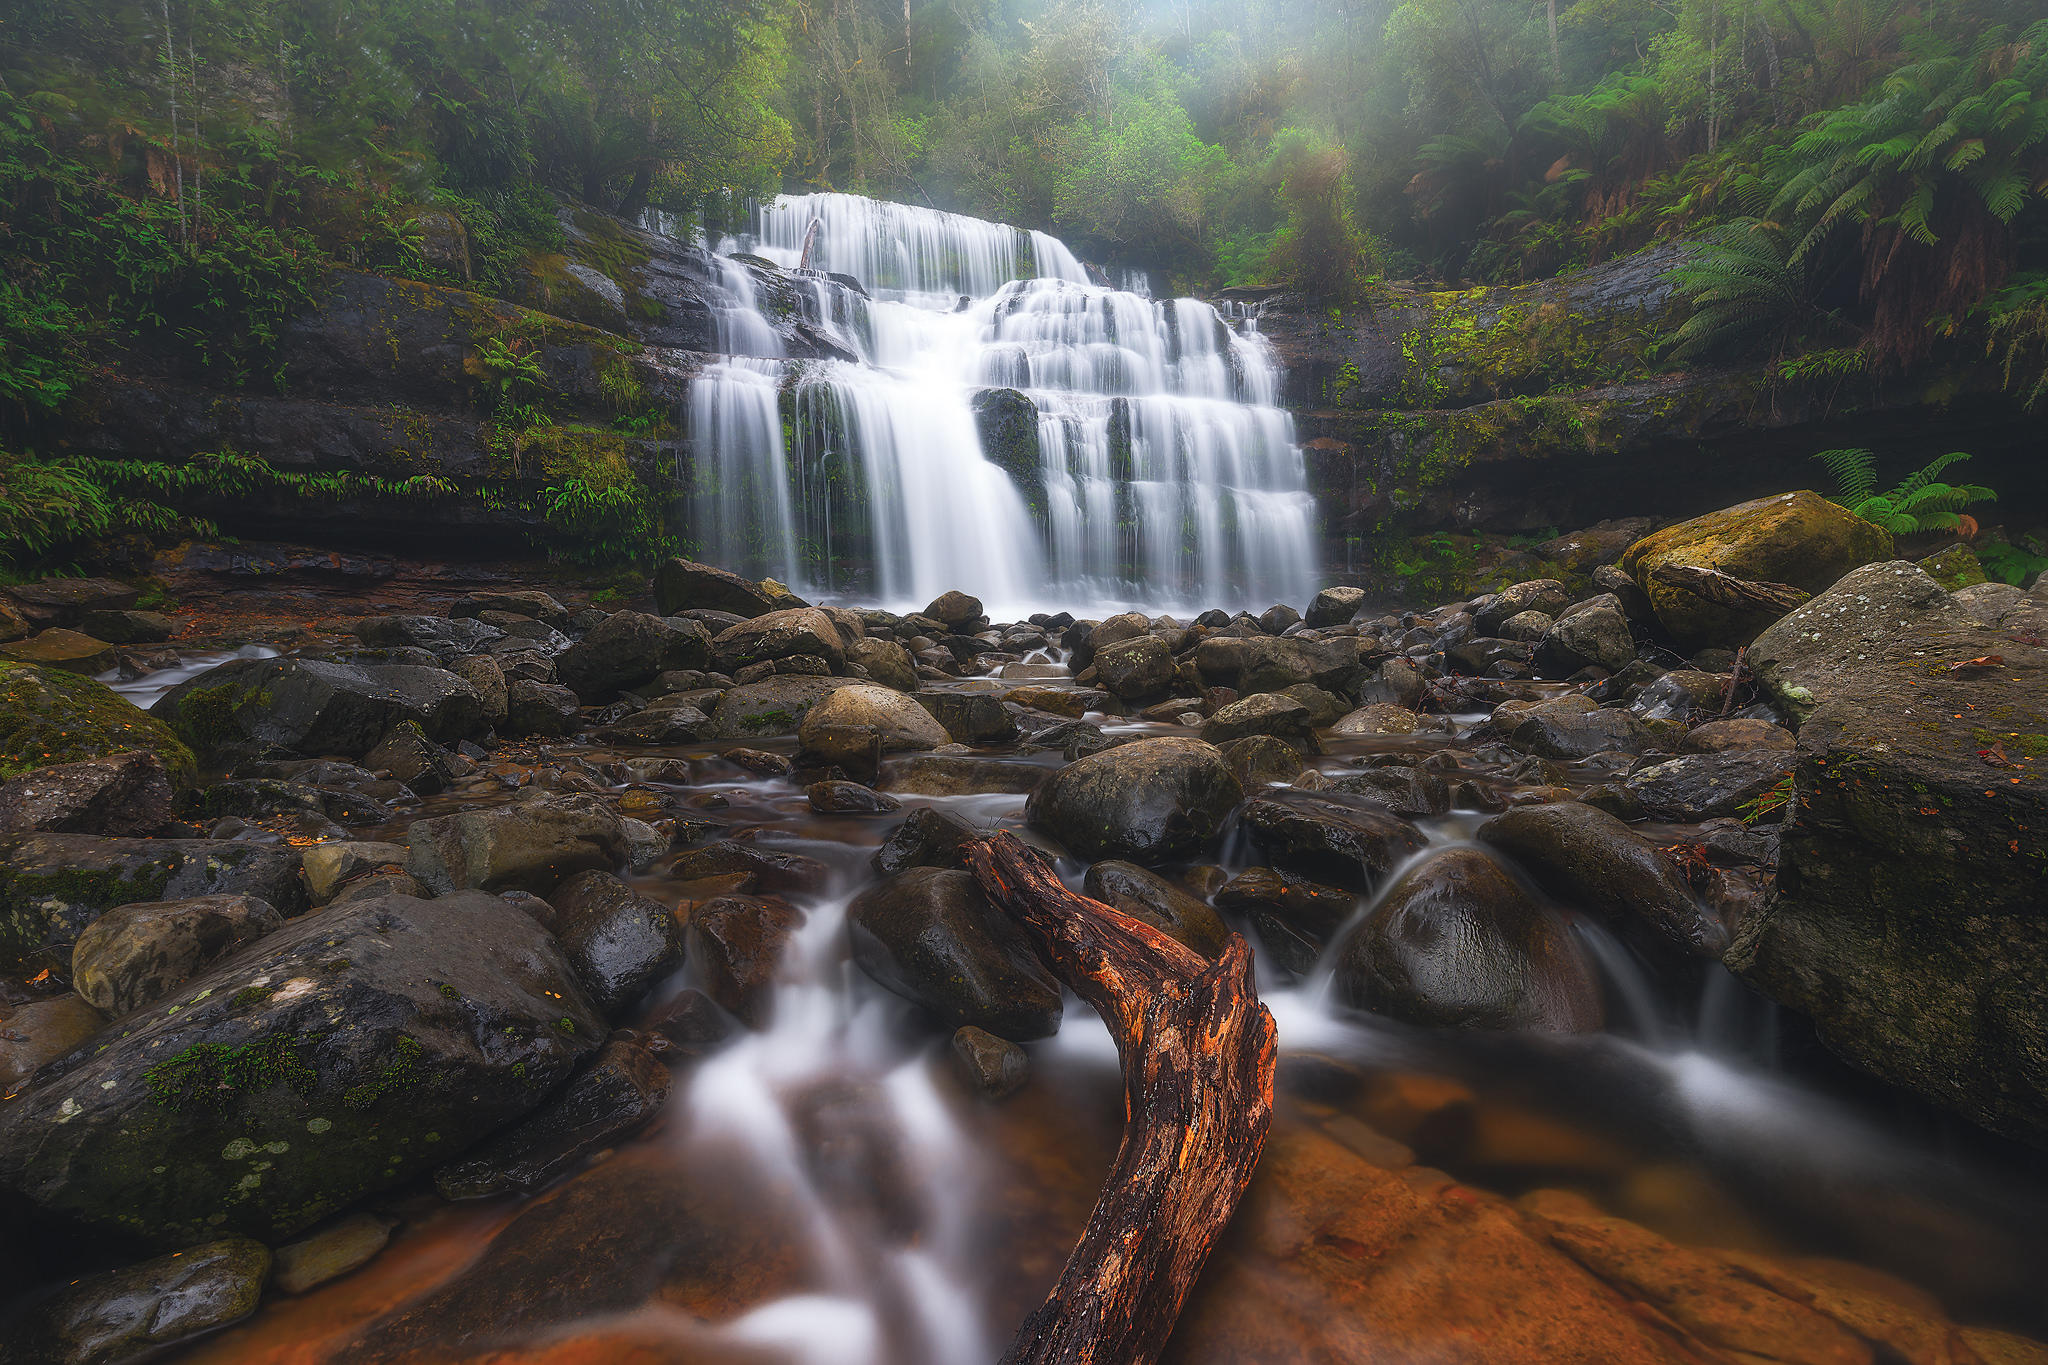 Liffey Falls, Tasmania, Австралия, водопад, река, лес, деревья, камни, скалы, туман, пейзаж